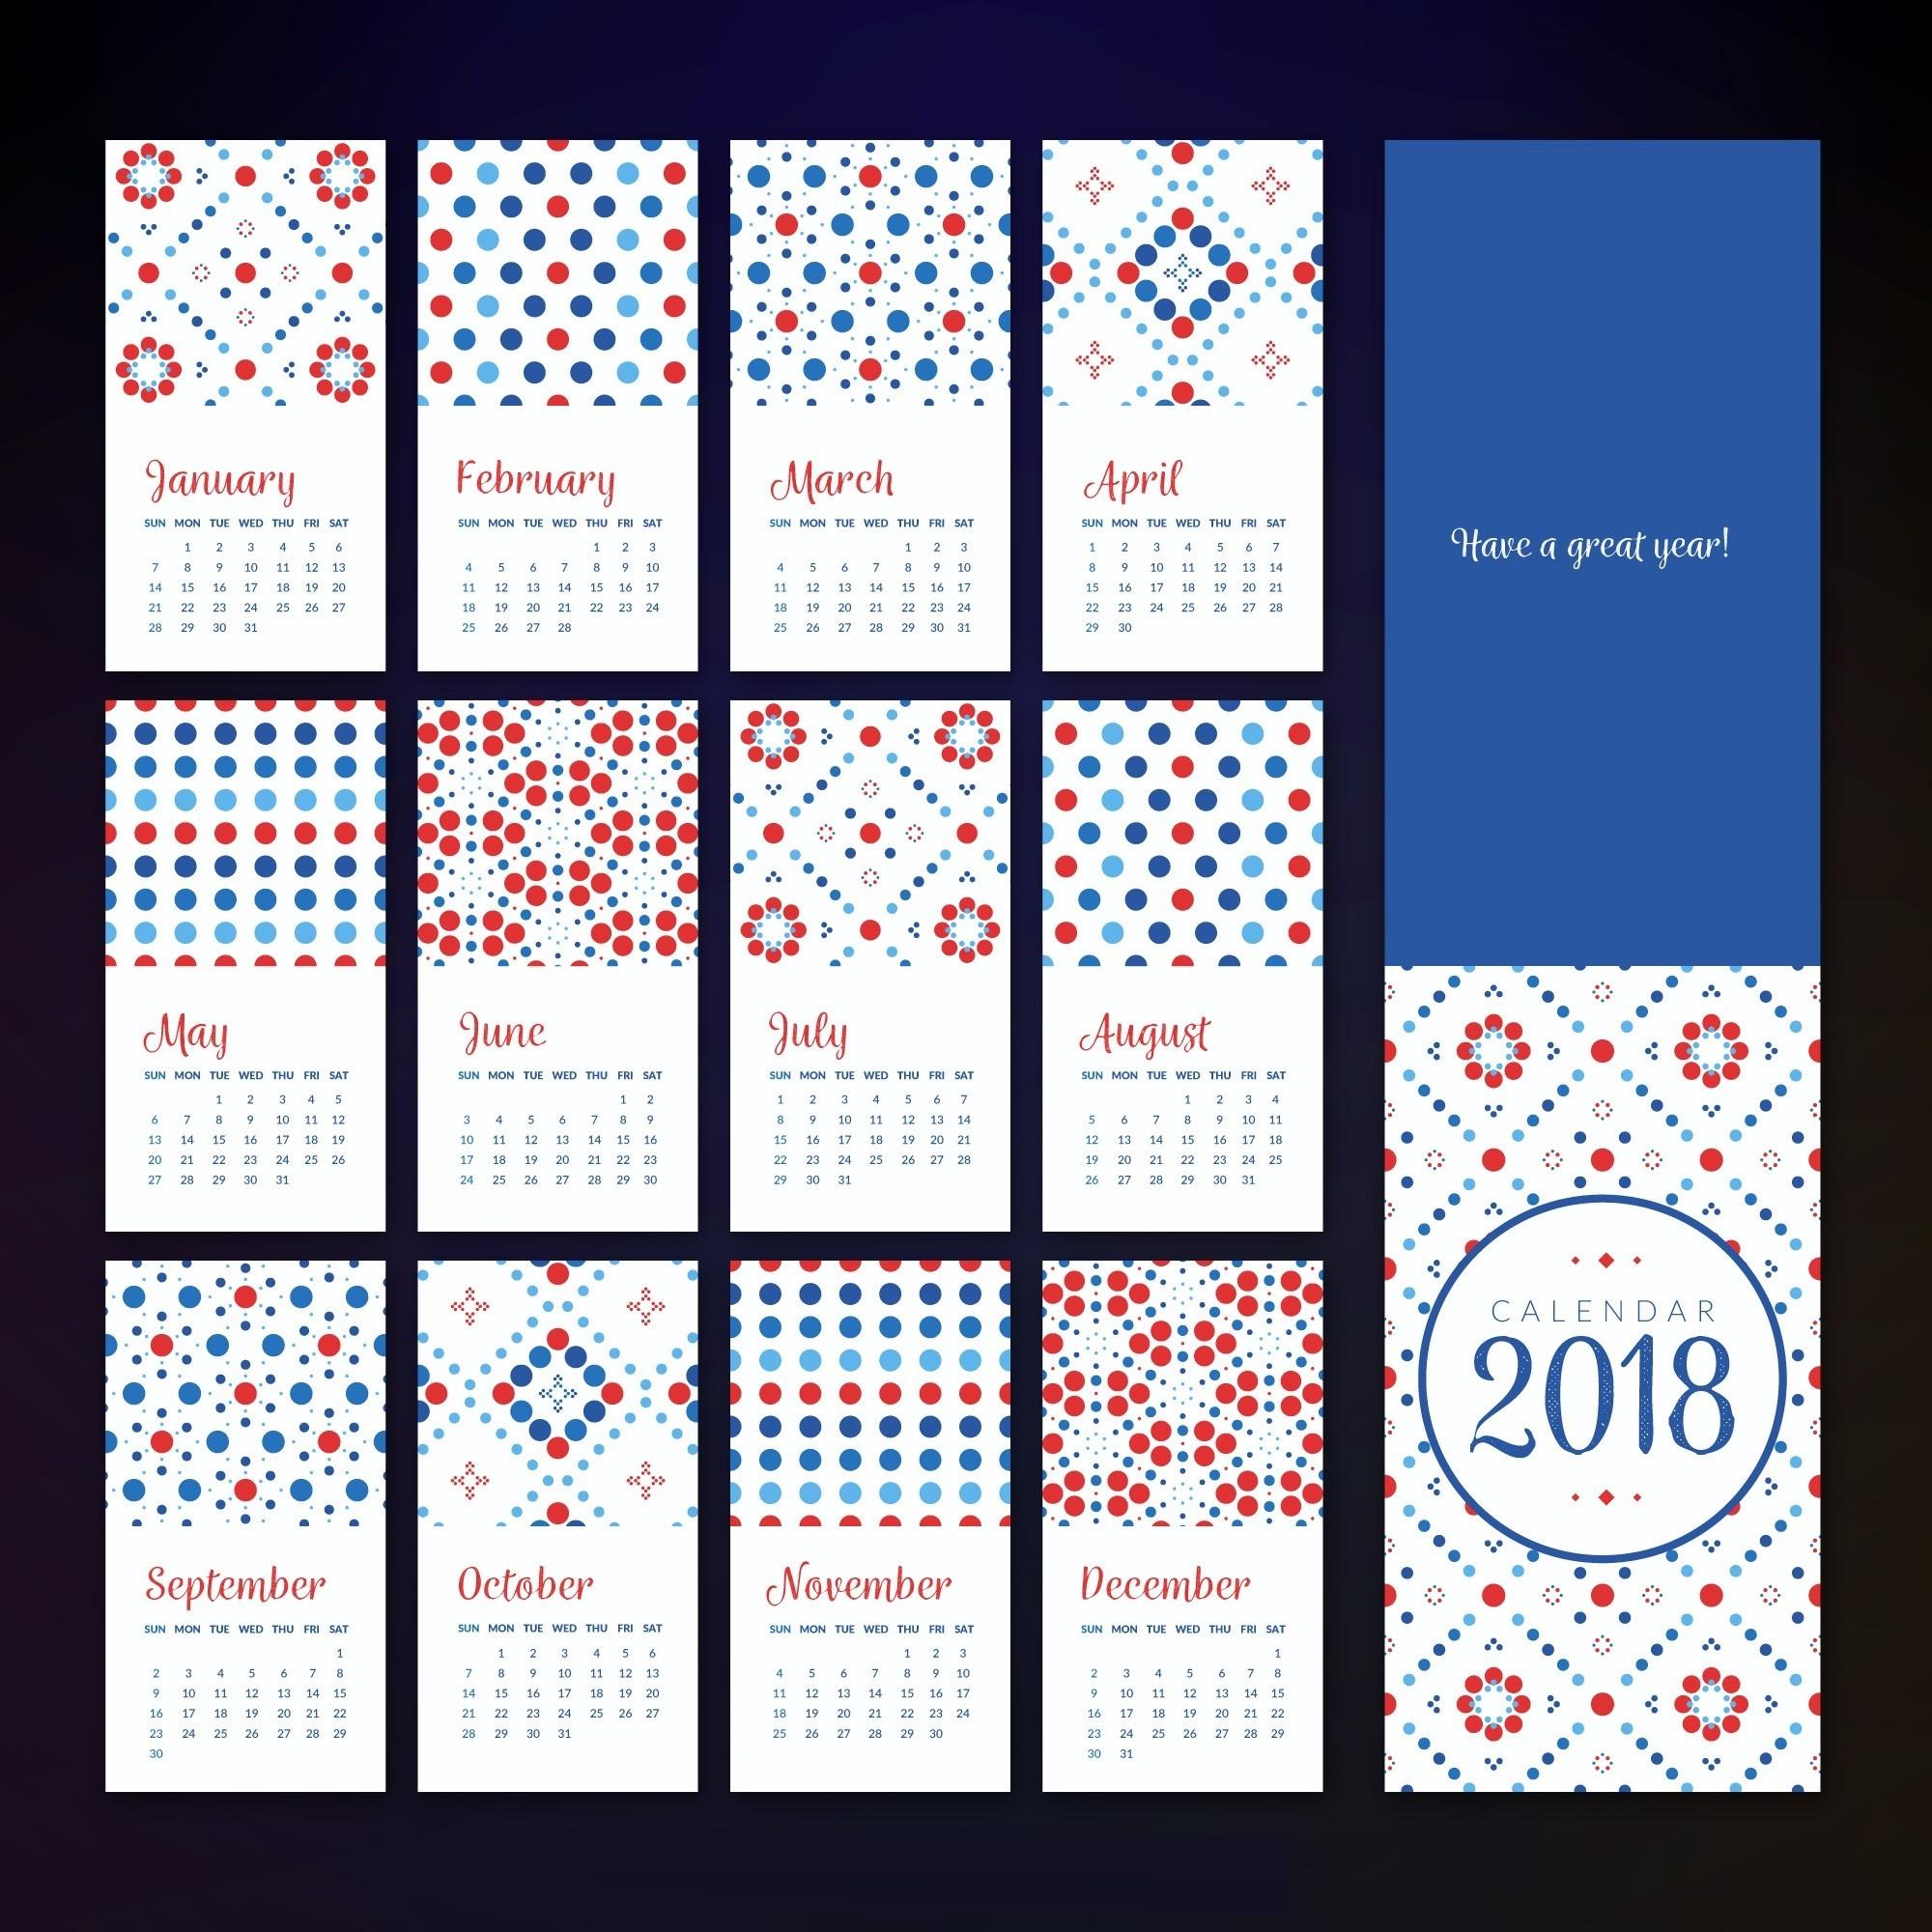 2018 Wallpaper Calendar 72 Images